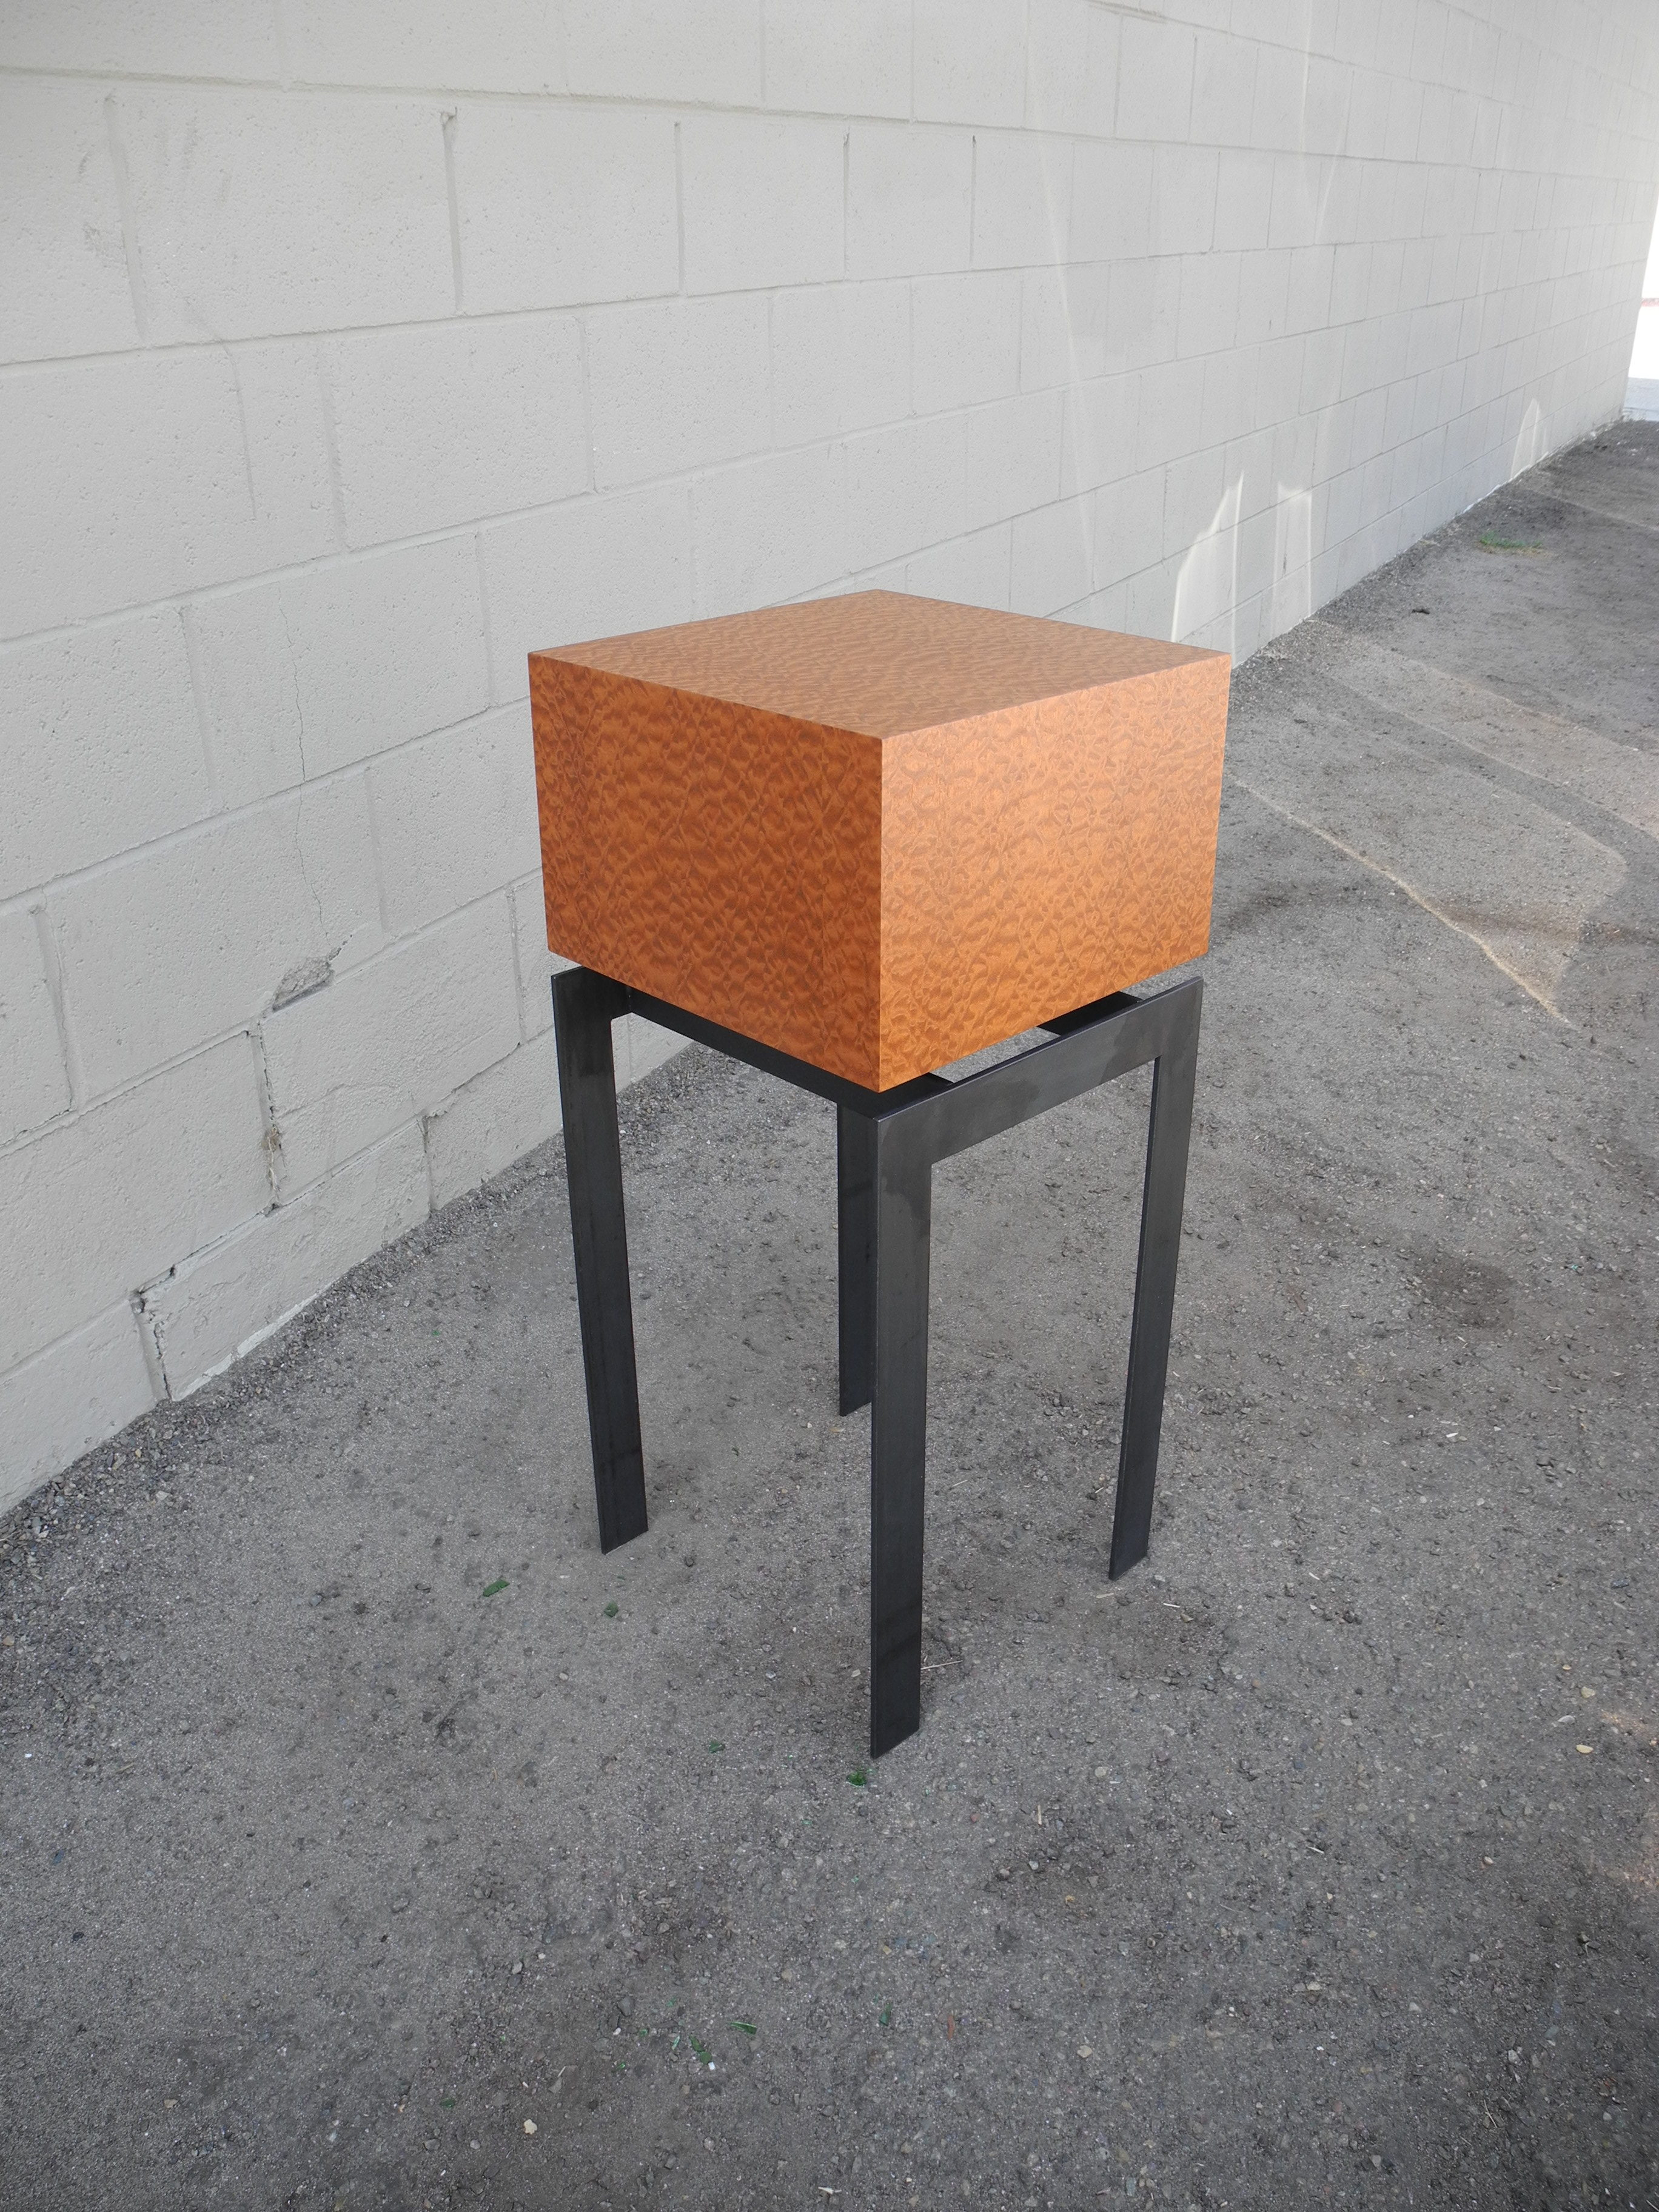 display pedestal end table square pommele sapele wood